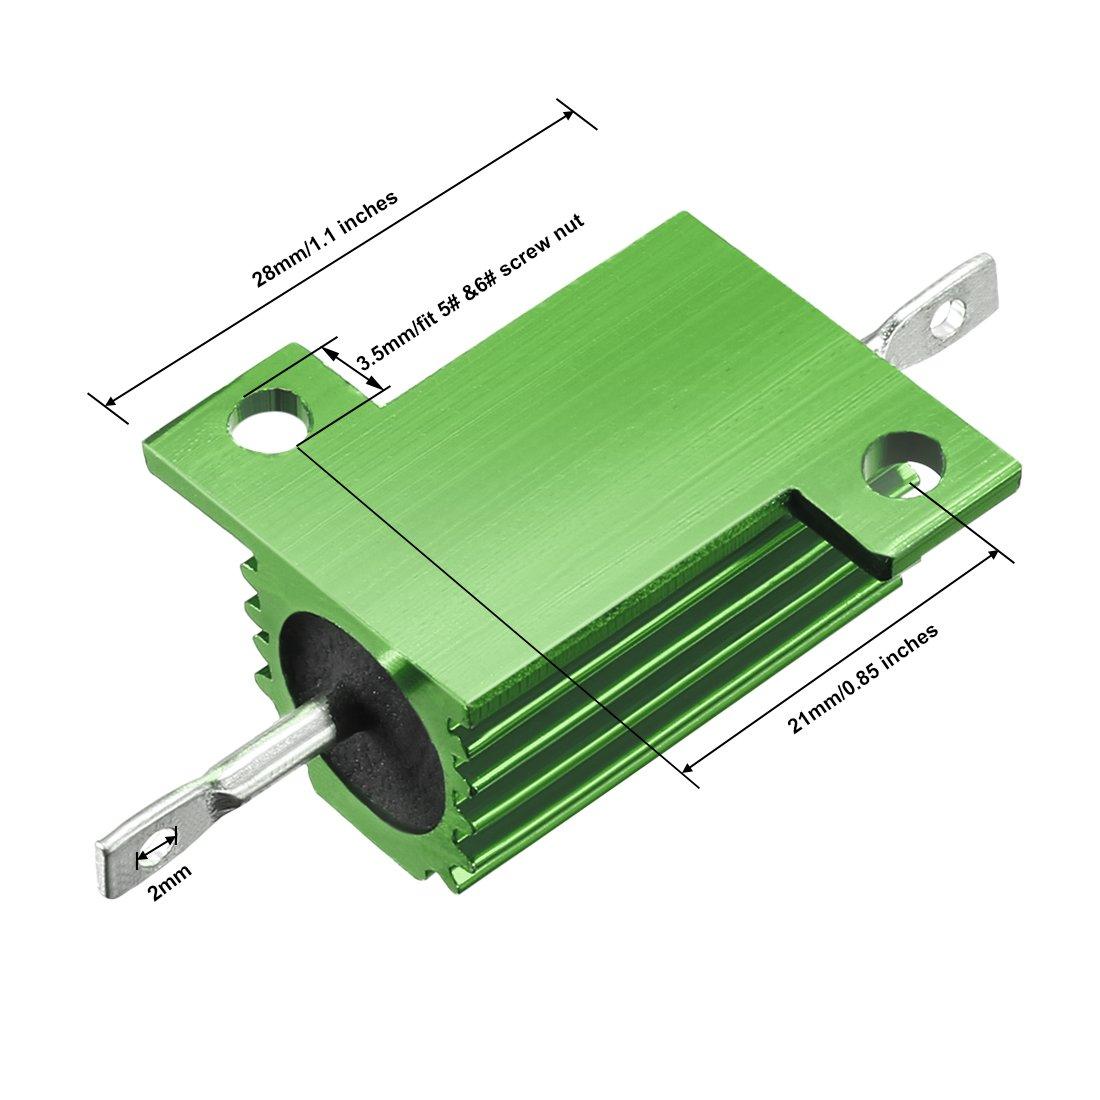 Led Load Resistor 25w 10ohm Manual Guide